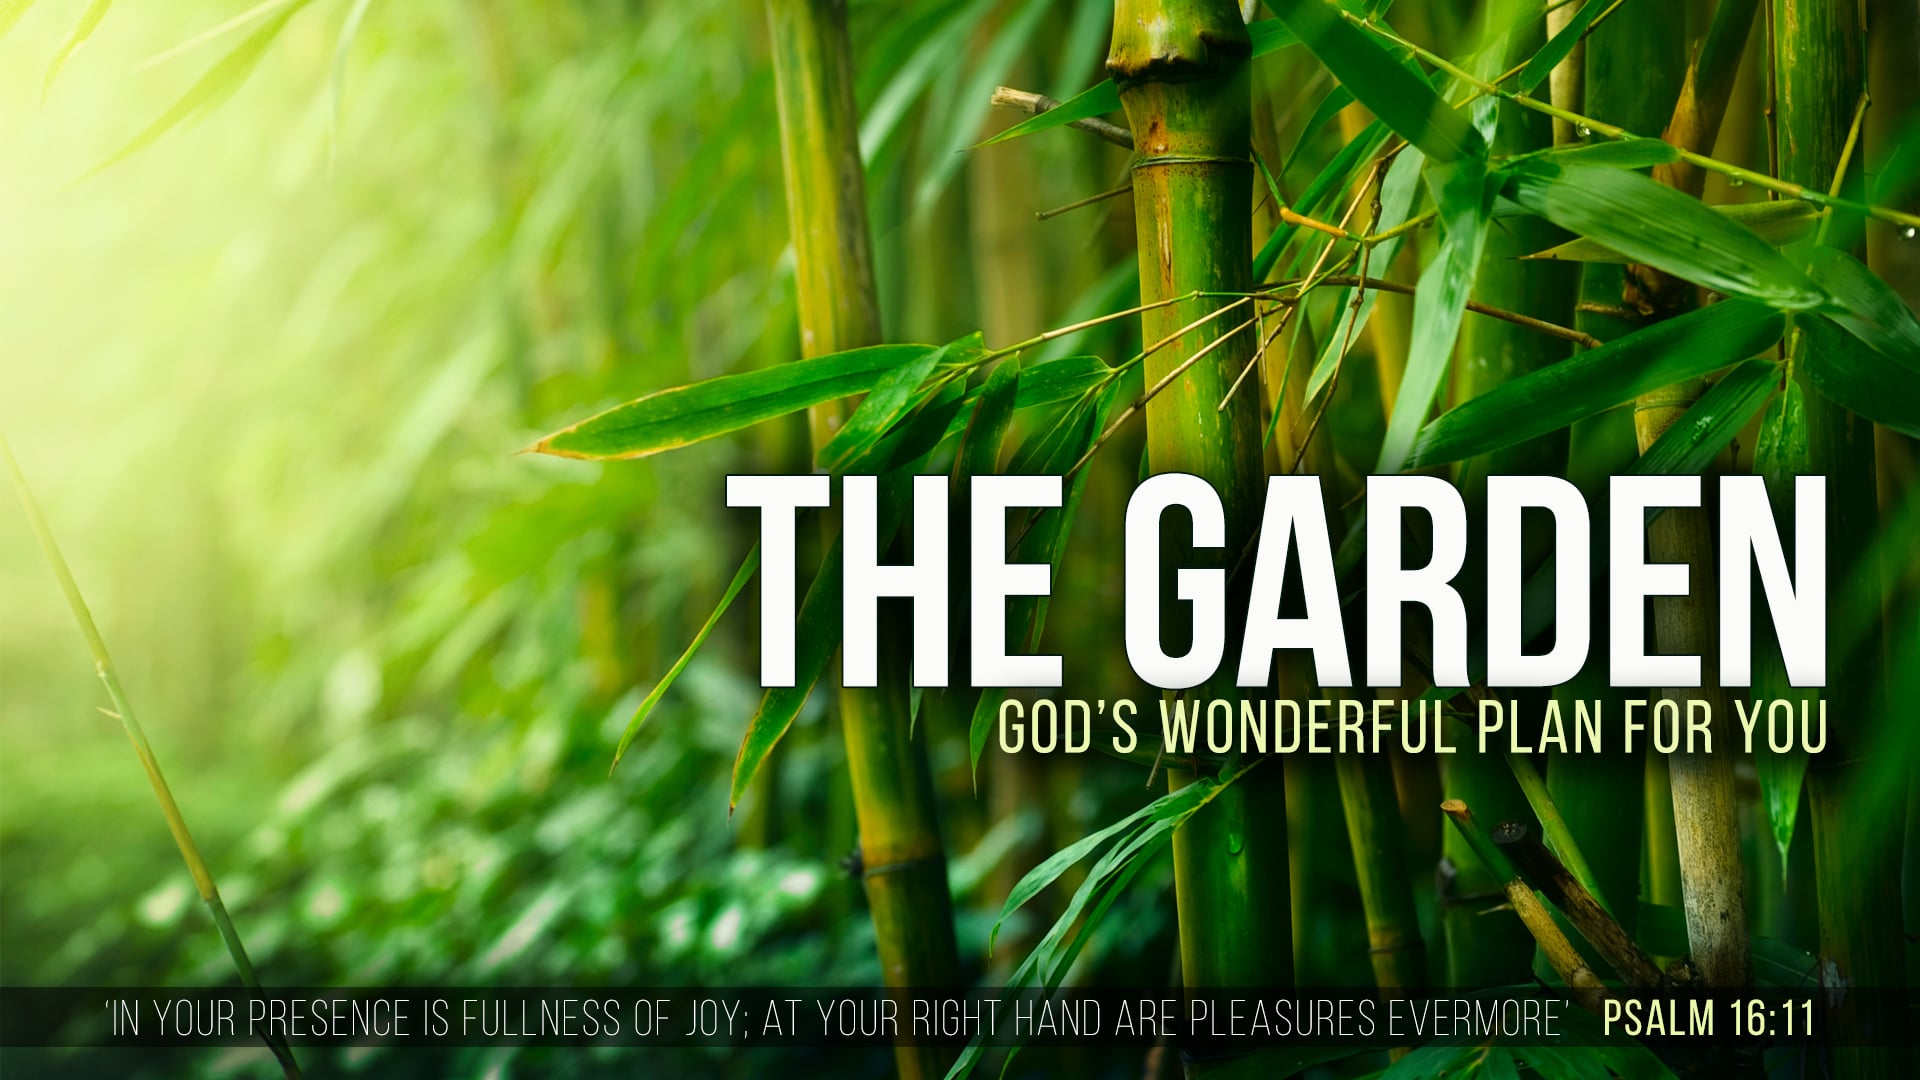 The Garden - Part 2